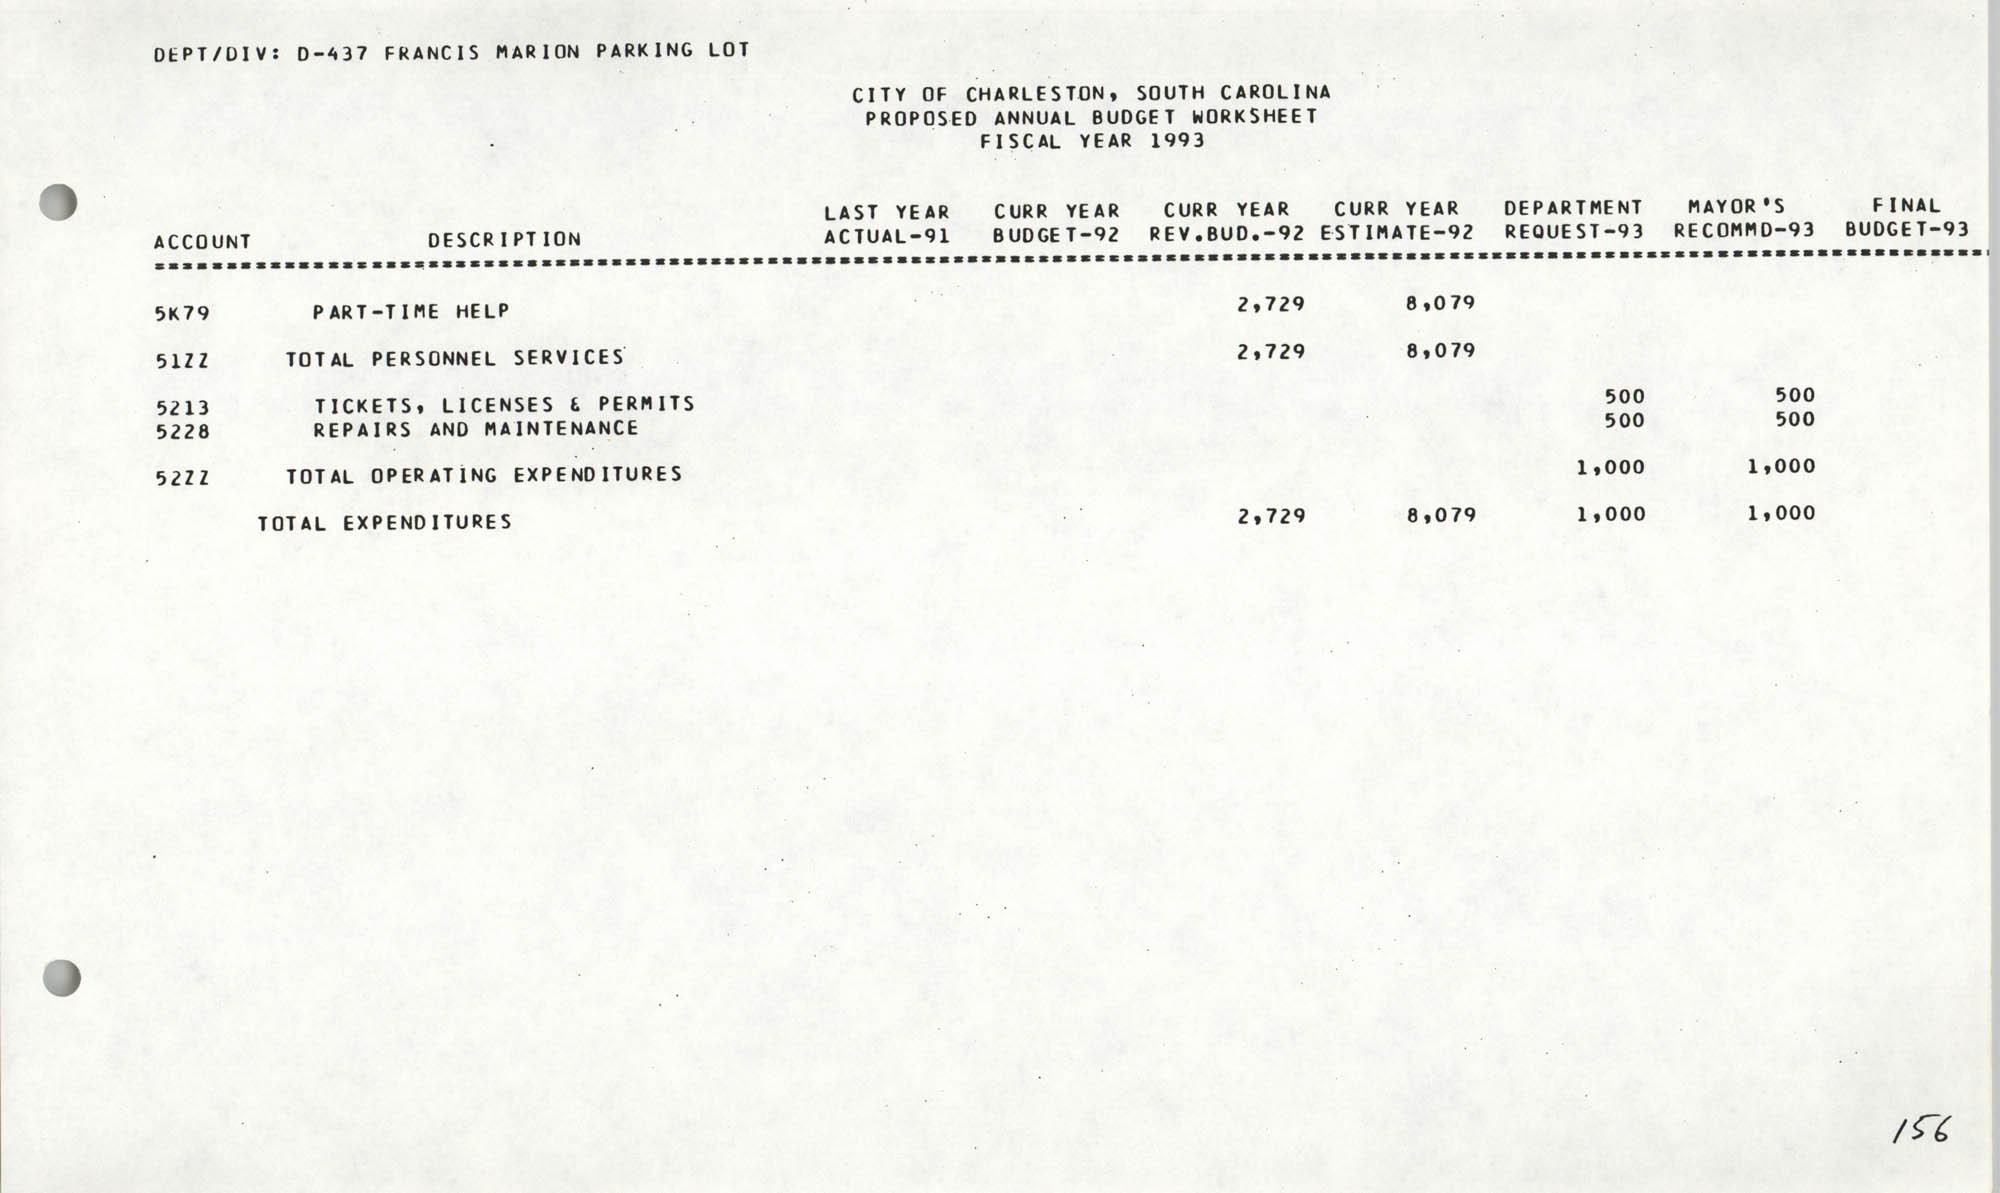 The City Council of Charleston, South Carolina, 1993 Budget, Page 156